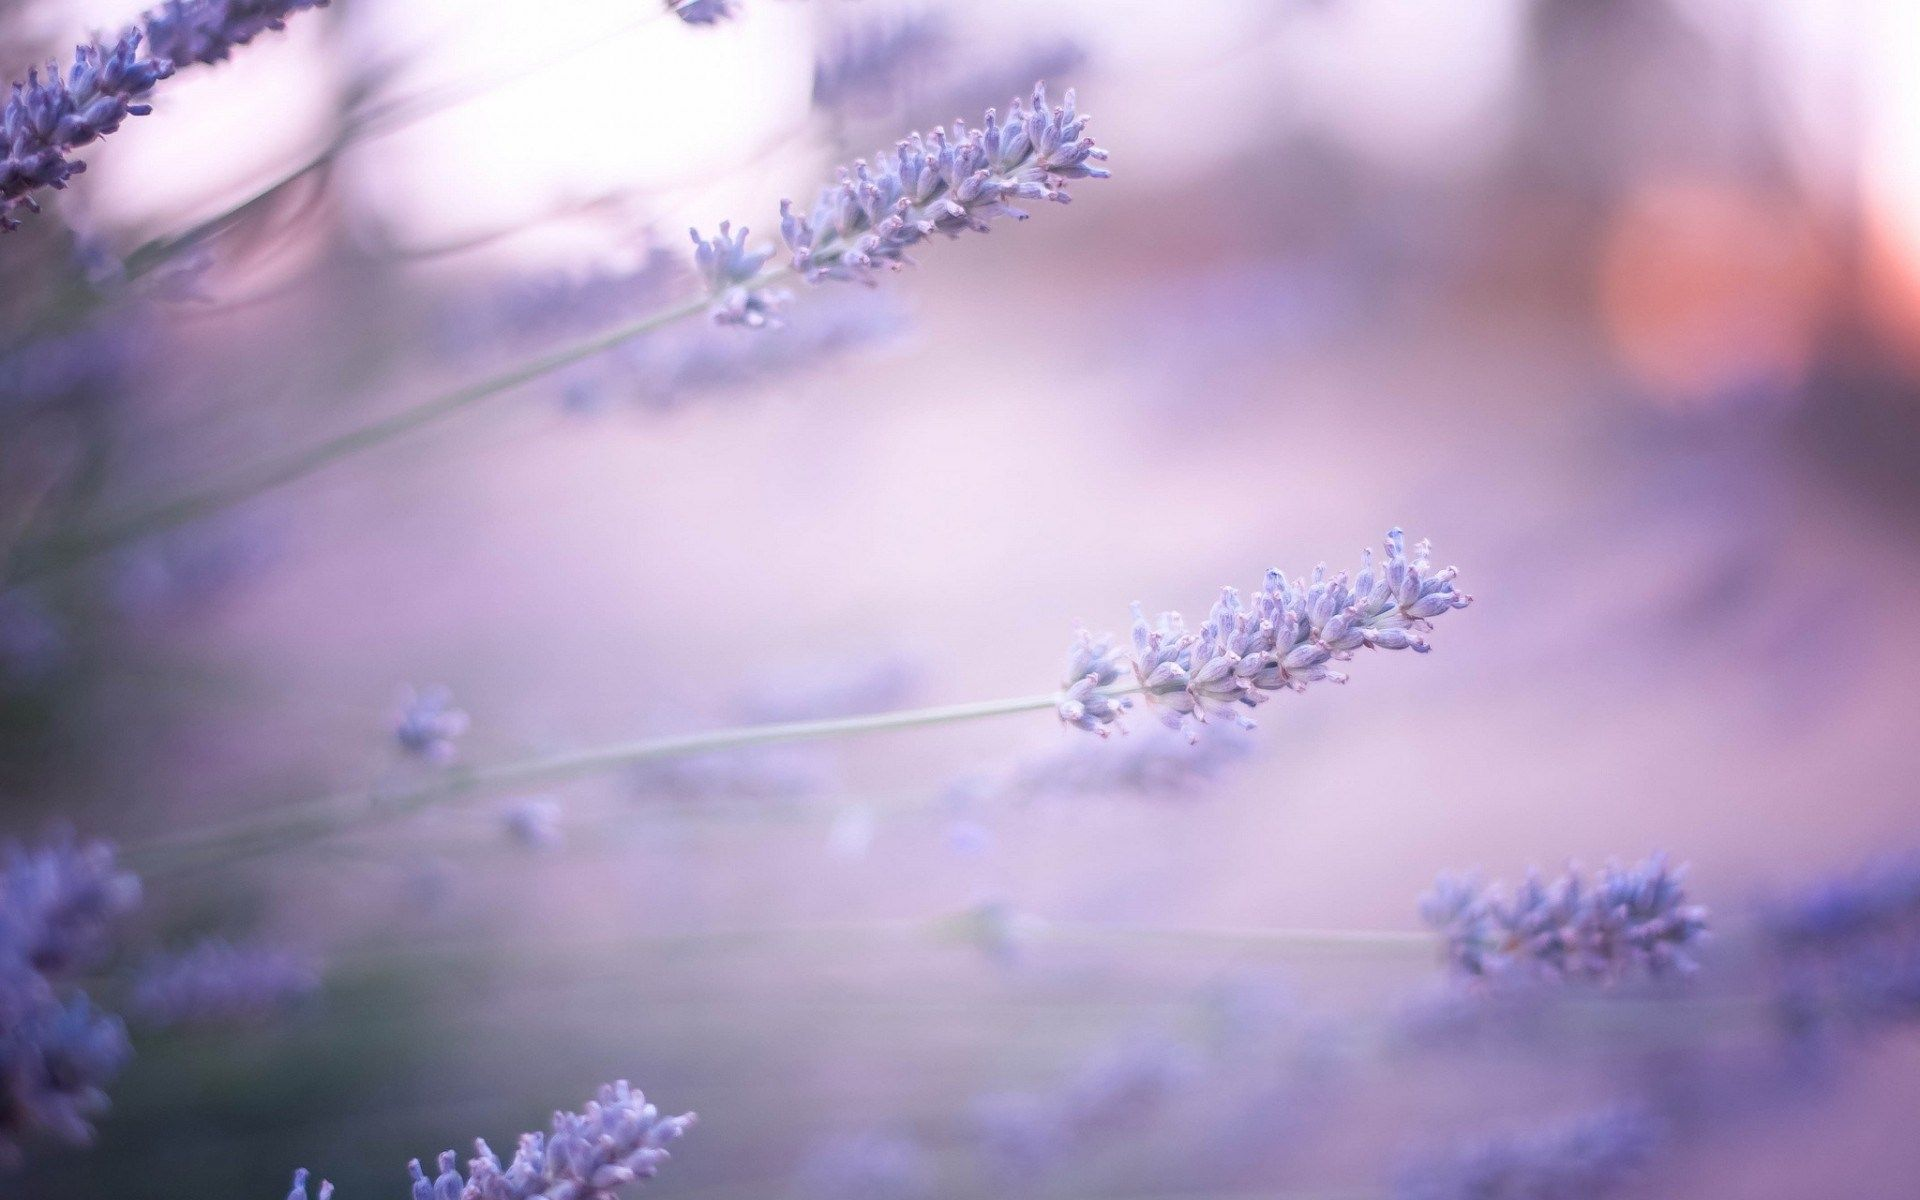 Lavender Farm Hd Wallpapers Page 0 Flower Wallpaper Lavender Flowers Flower Backgrounds